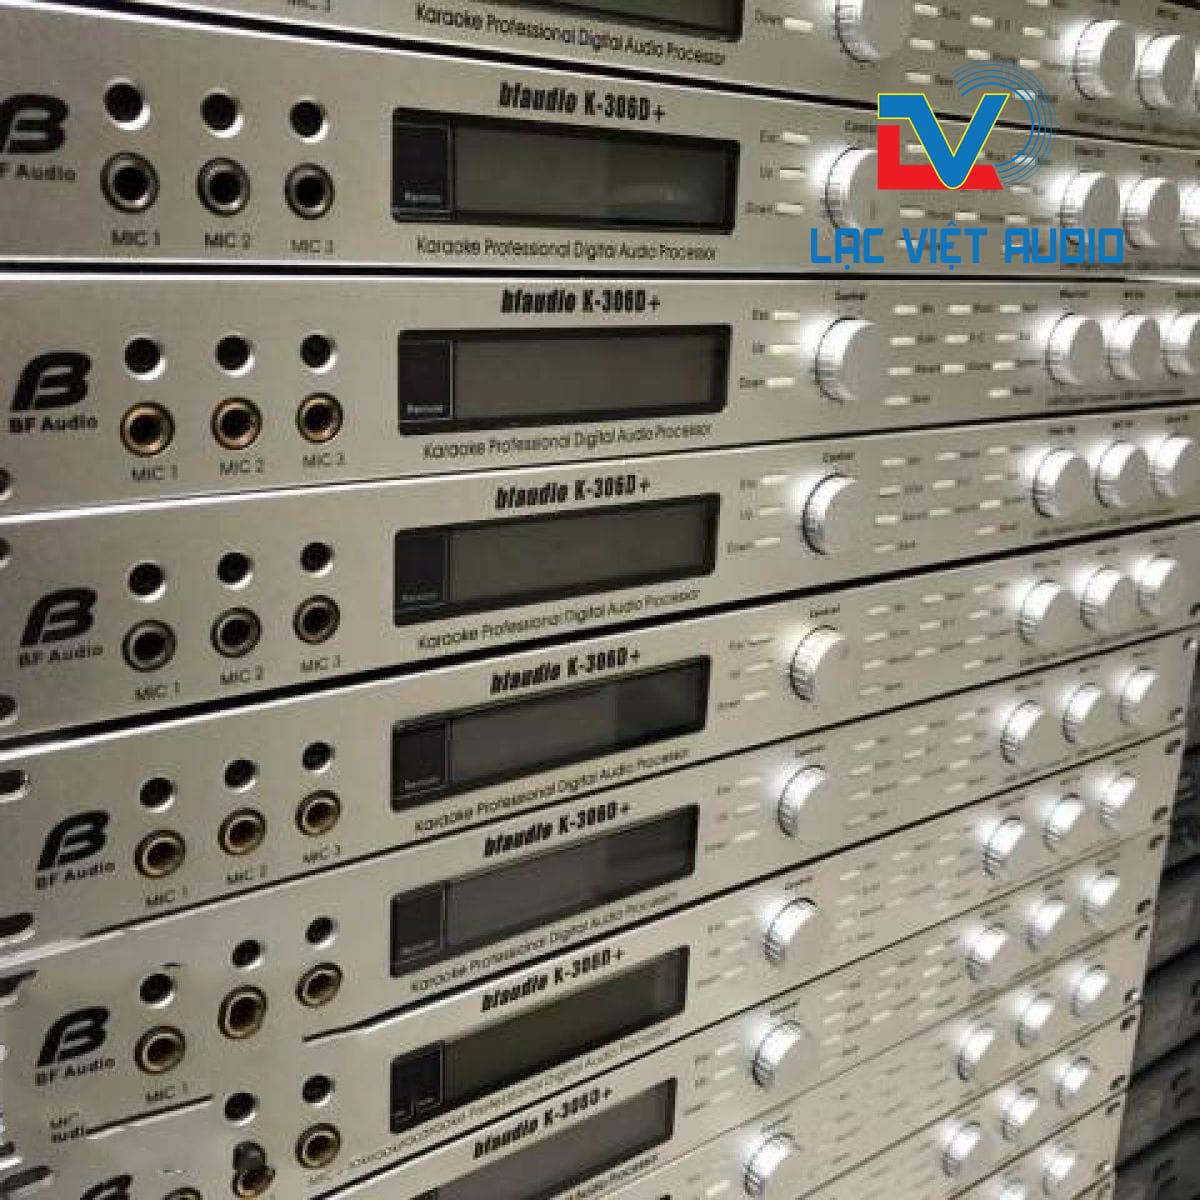 Ứng-dụng-Vang-số-bfaudio-k-306d